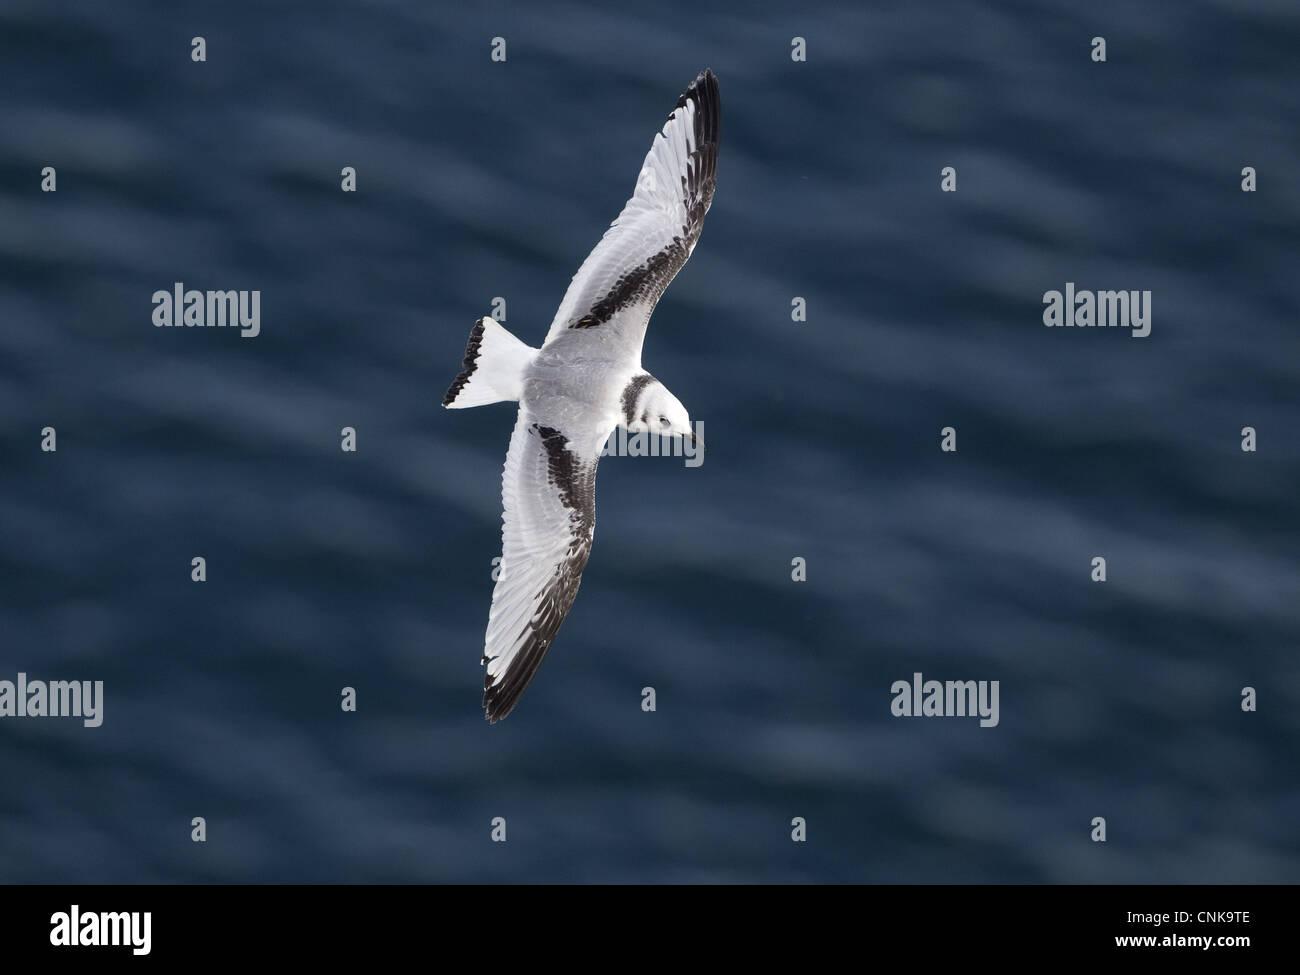 Kittiwake (Rissa tridactyla) juvenile, in flight over sea, Bempton Cliffs RSPB Reserve, East Yorkshire, England, - Stock Image